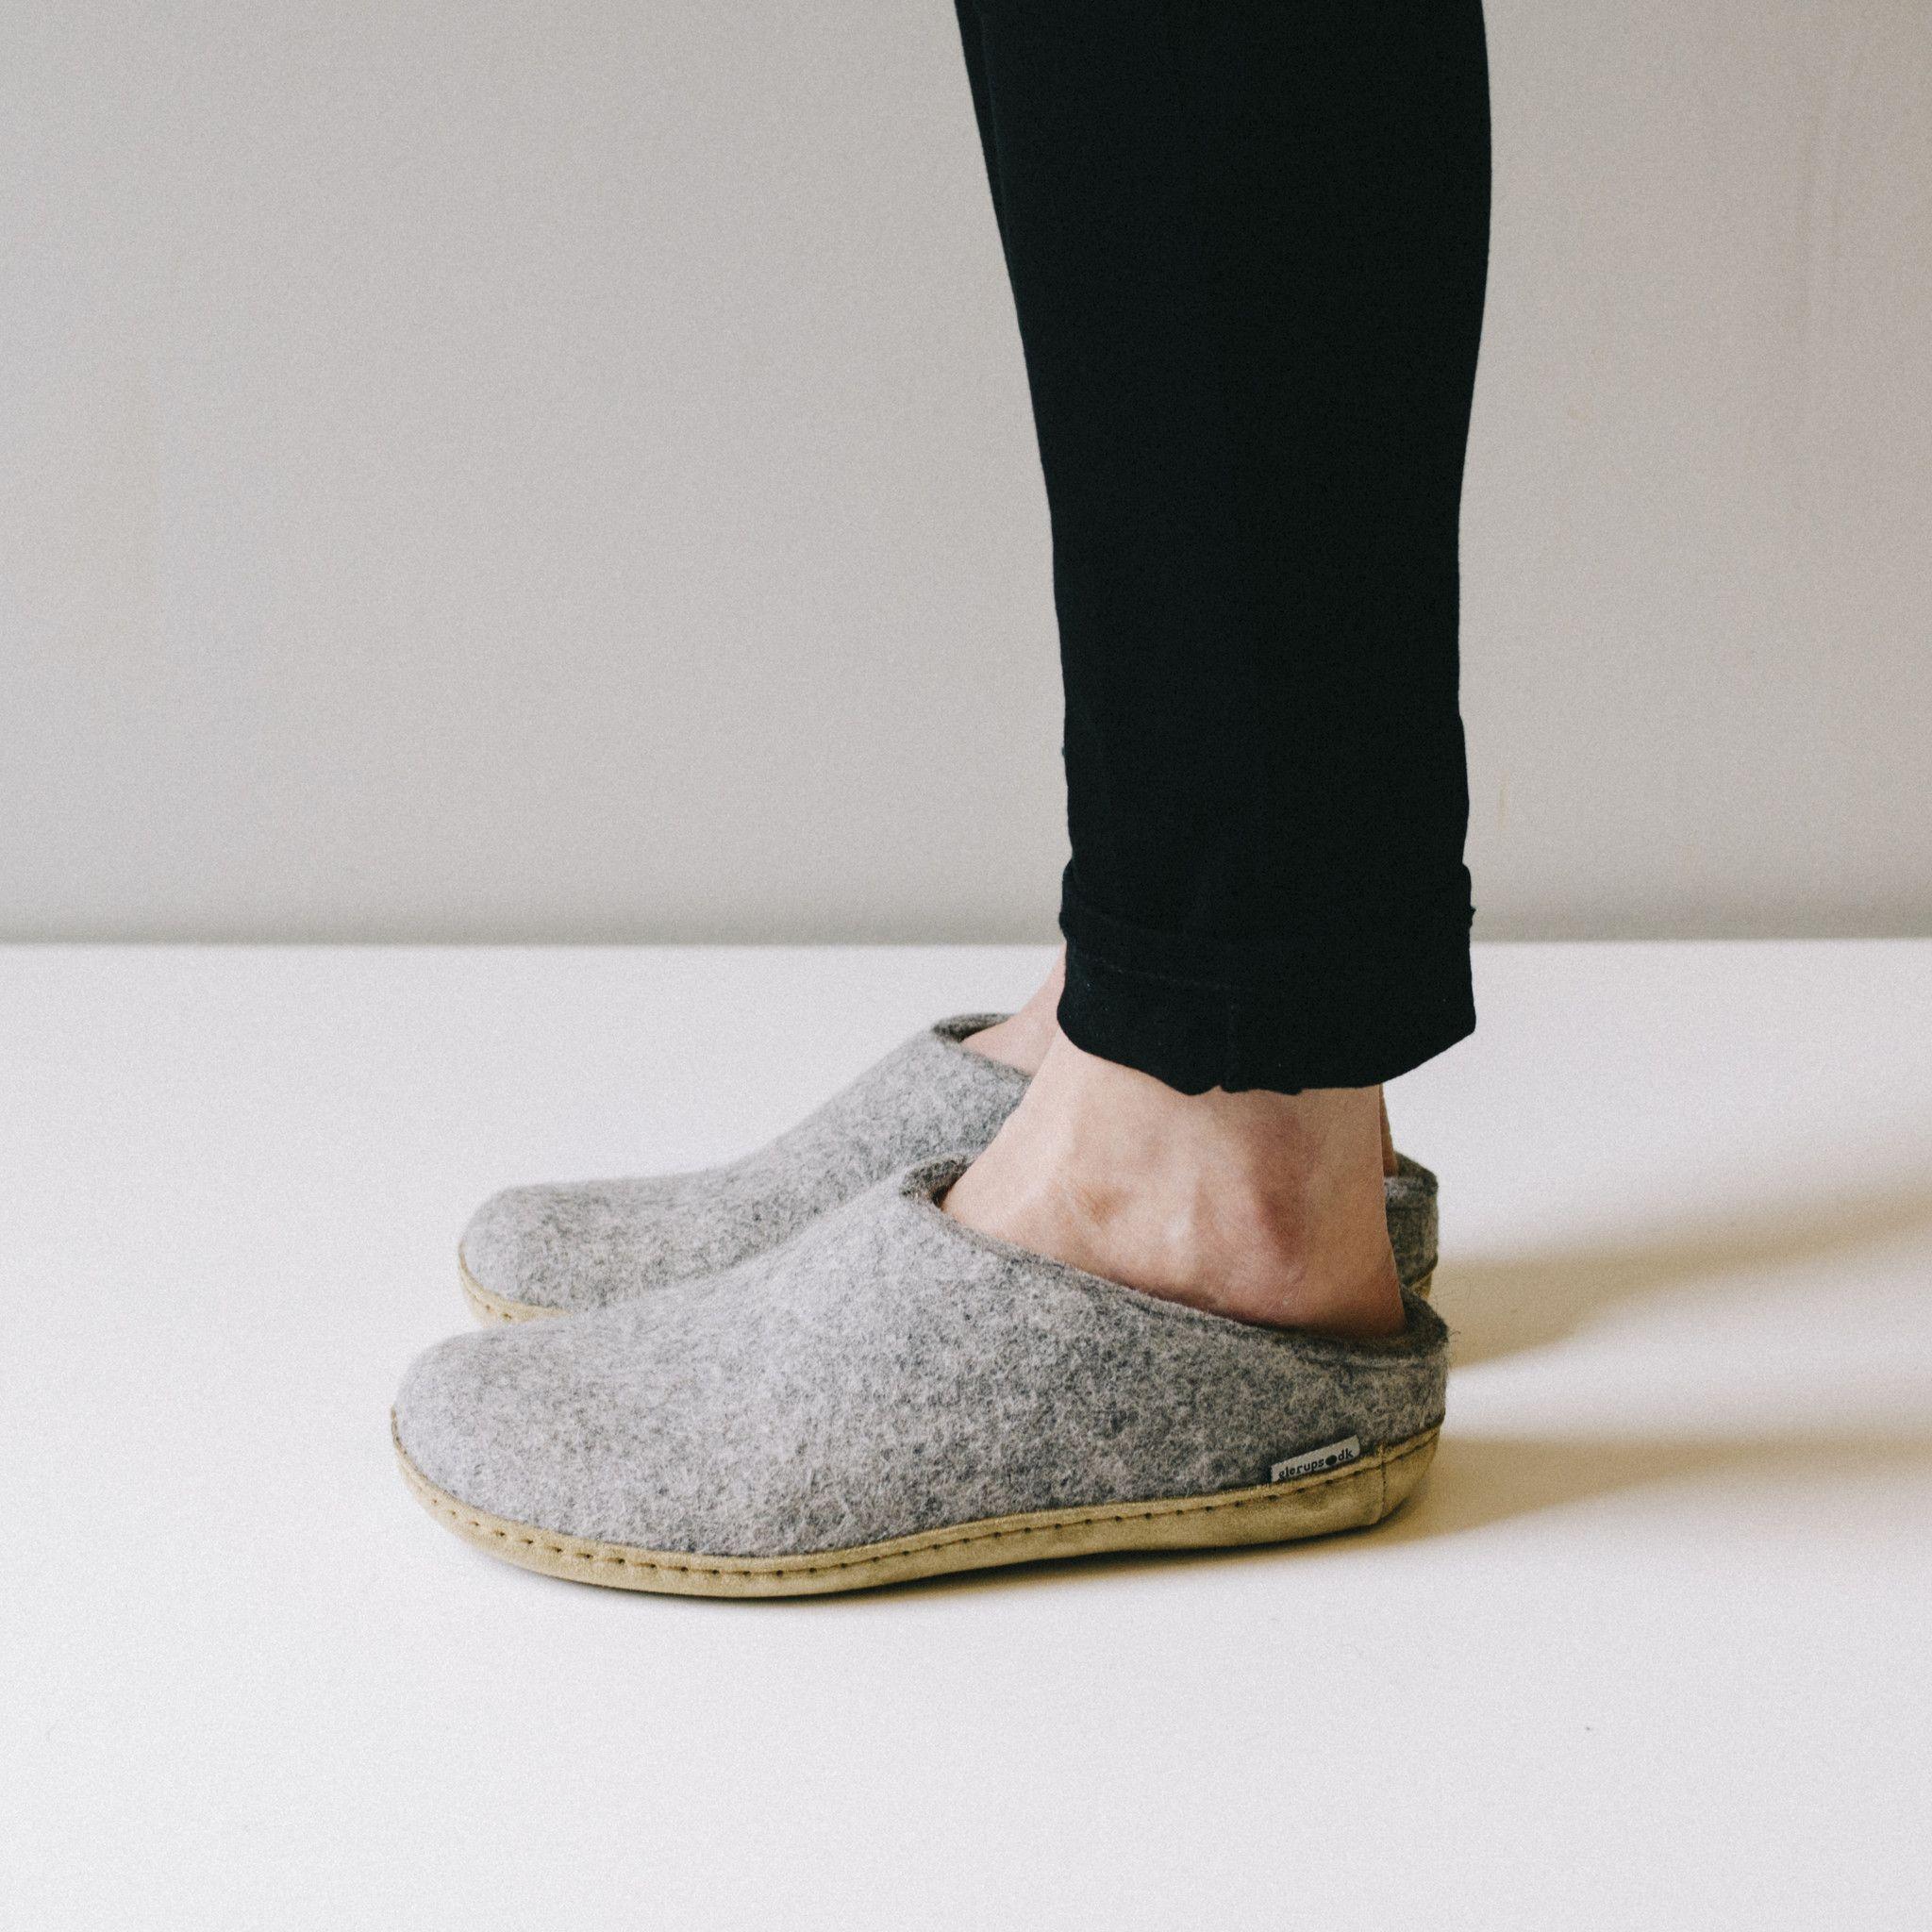 bac1d6797ef6 Glerups wool house shoe